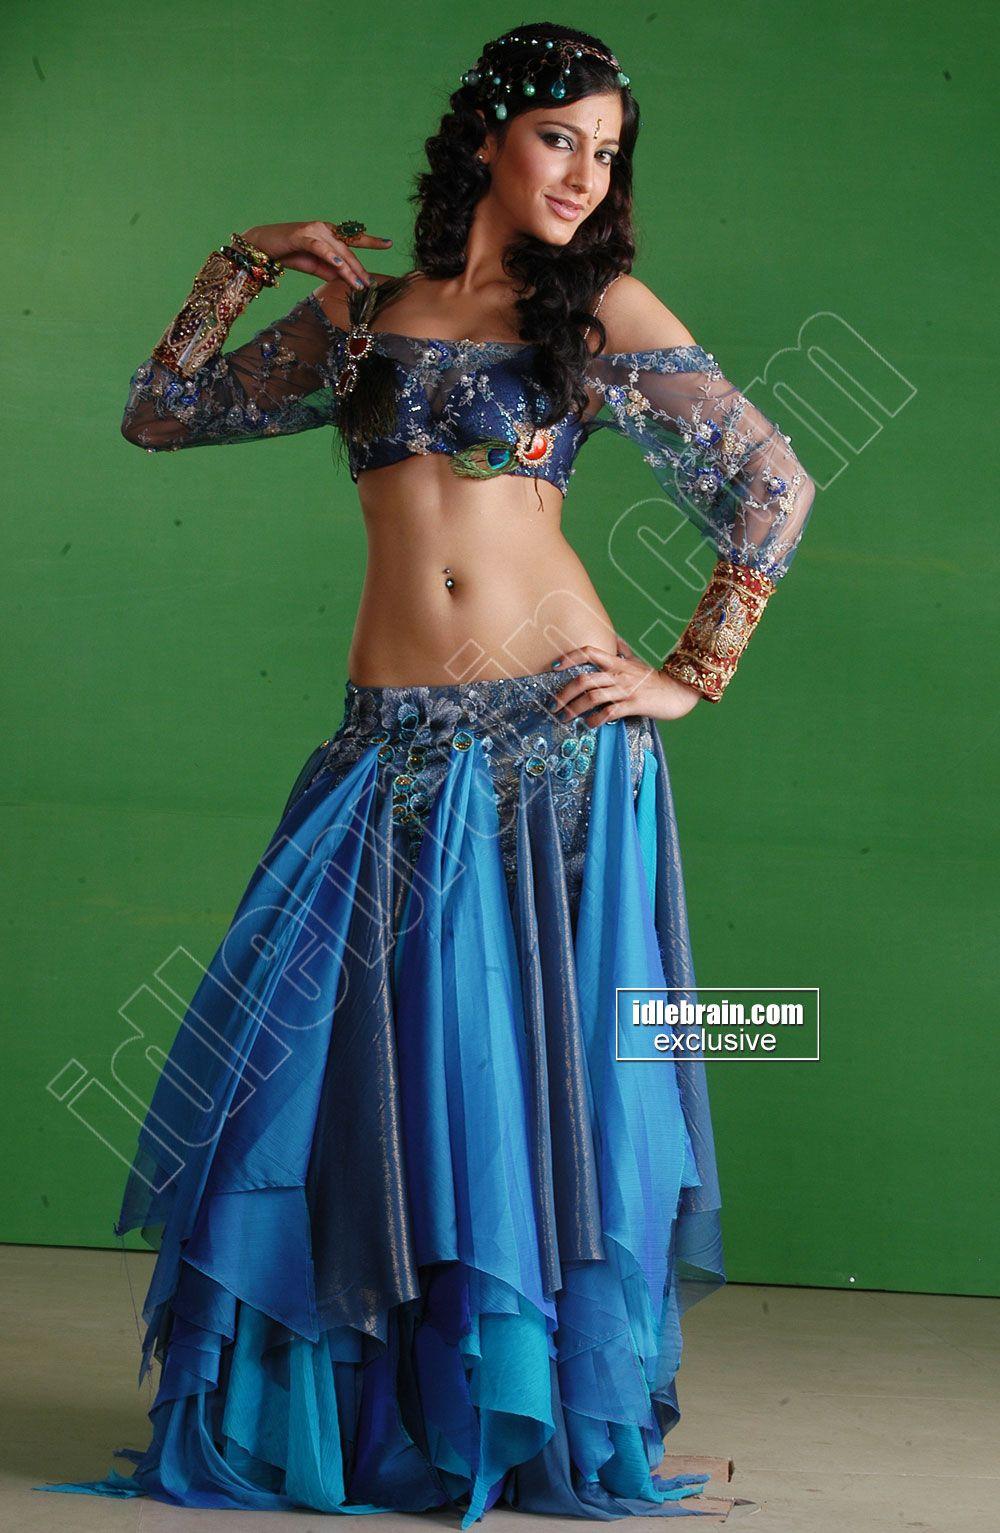 Slicypics Indian Actress Tamanna Bhatia Photos: Sruthi Hassan Hot Navel N B00Bs Show..Latest Spicy Pics